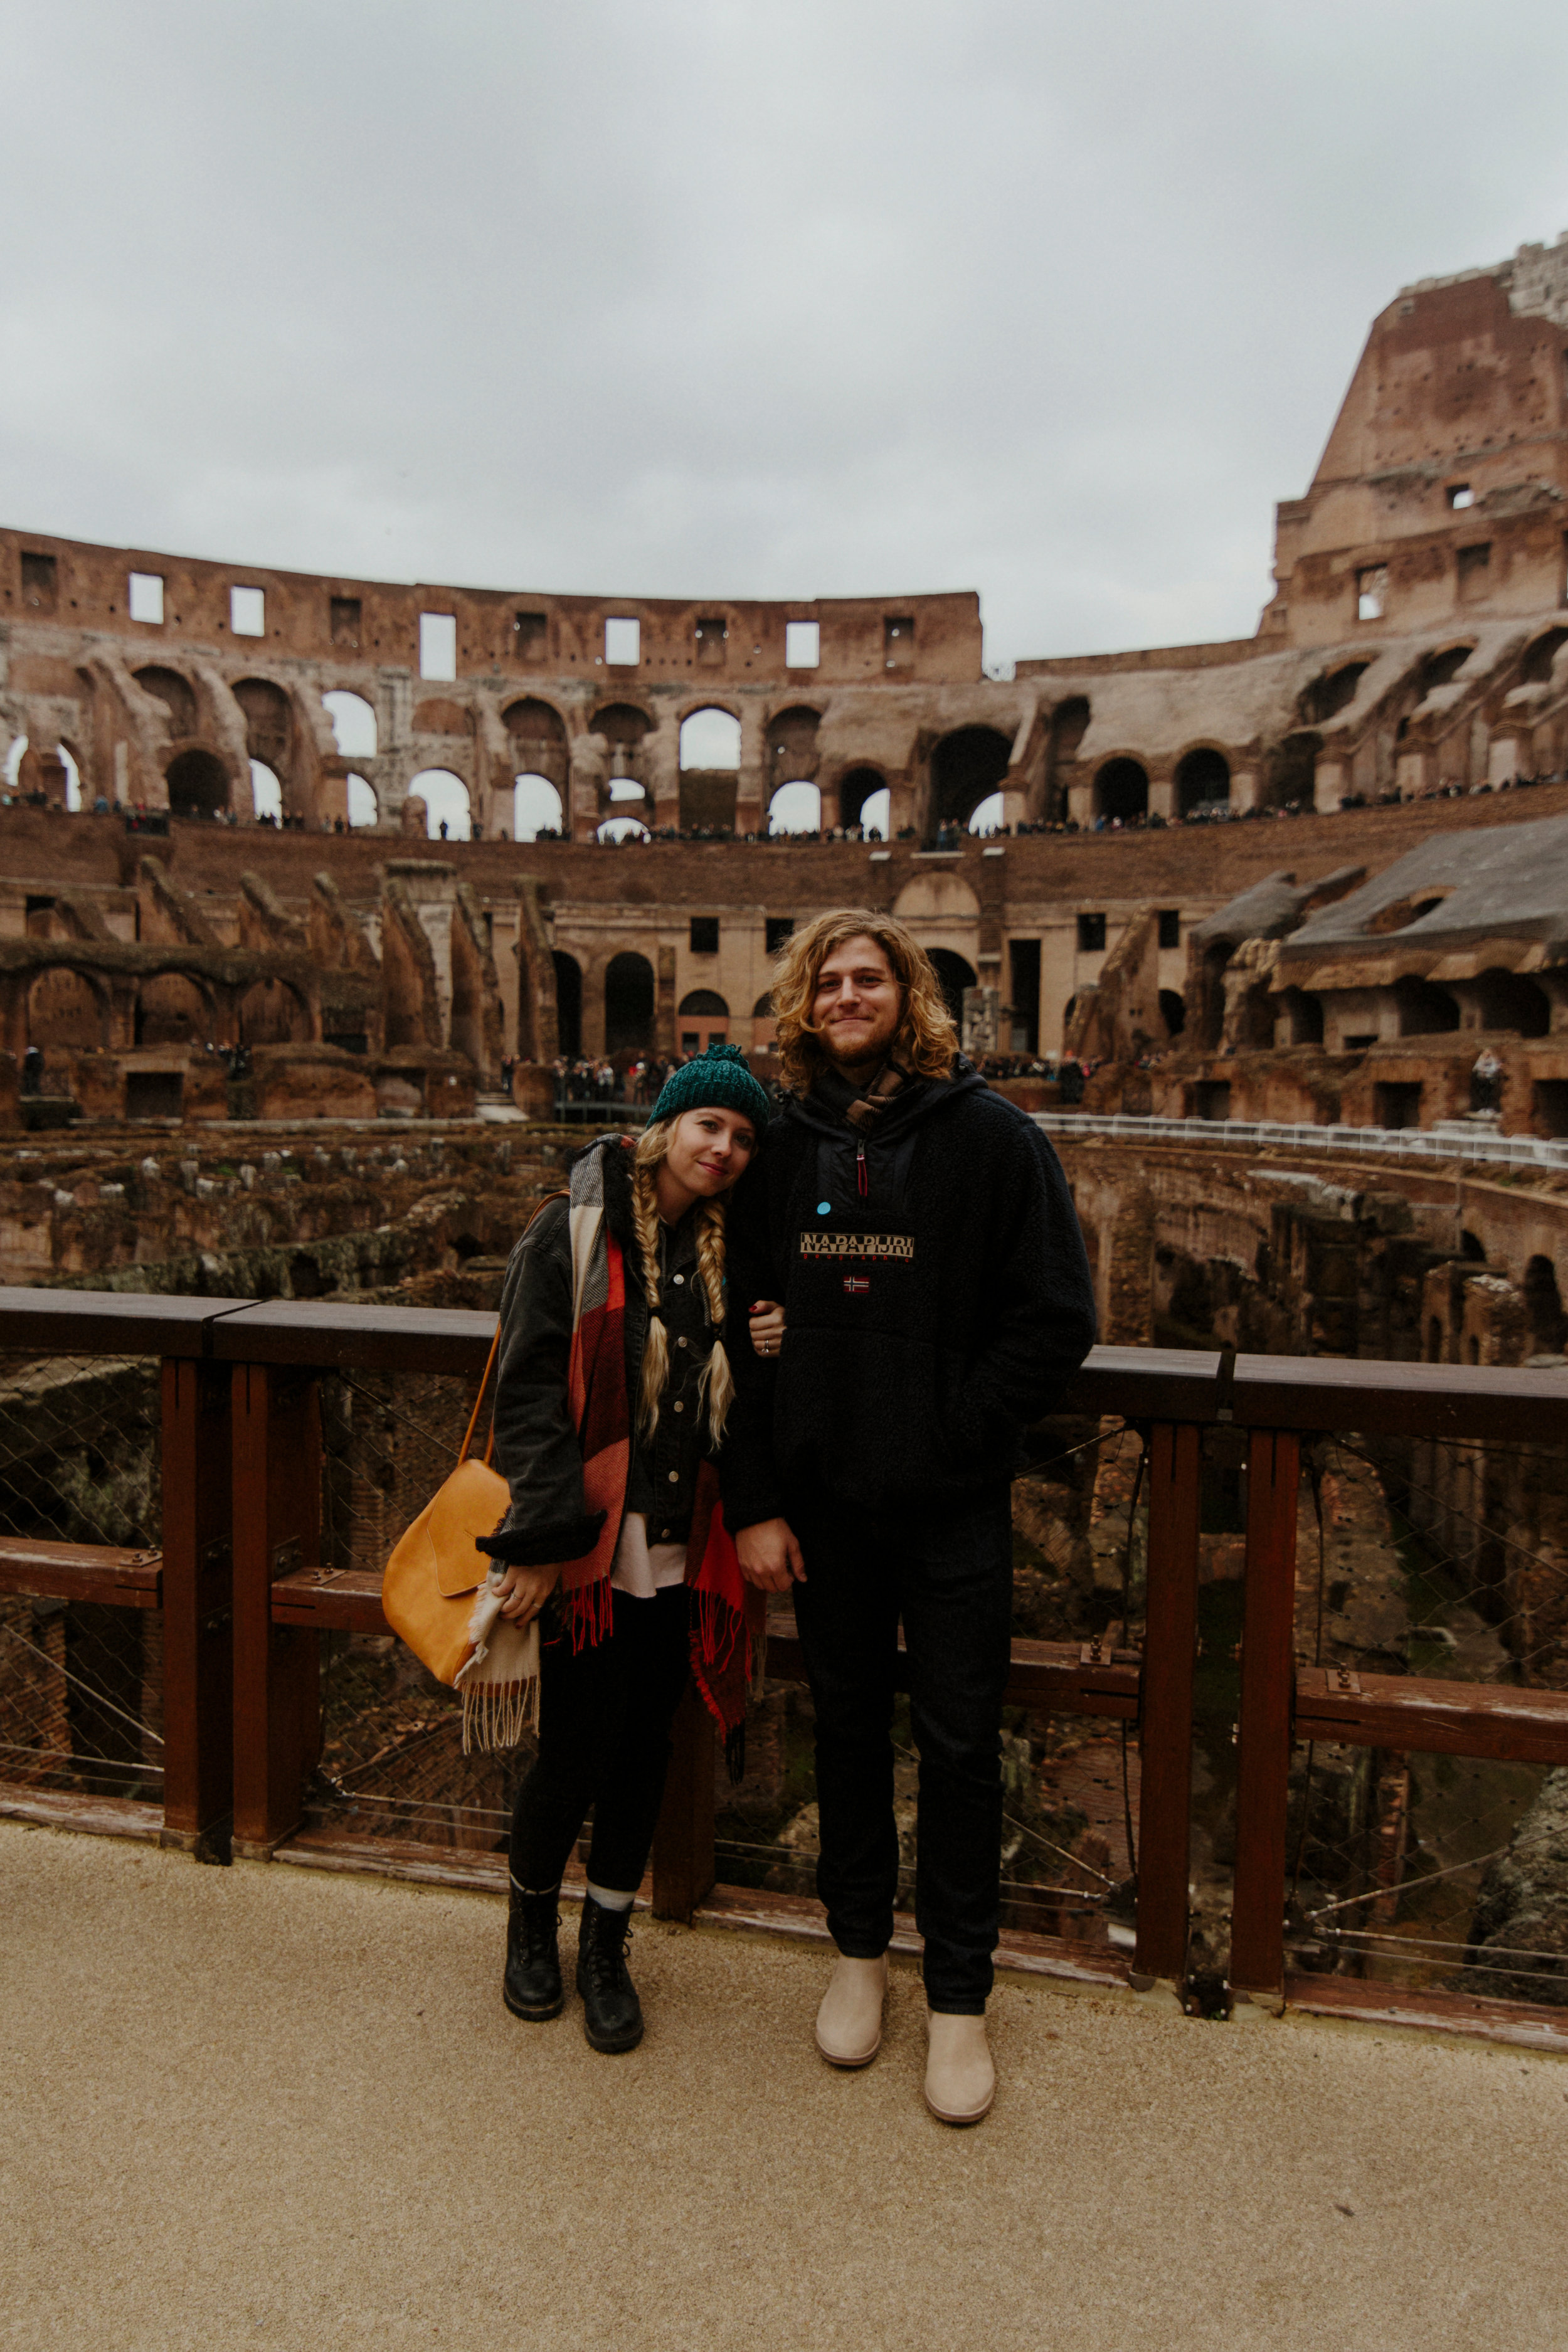 Italy Happily Shavers Website-135Italy Happily Shavers Website Grain.jpg